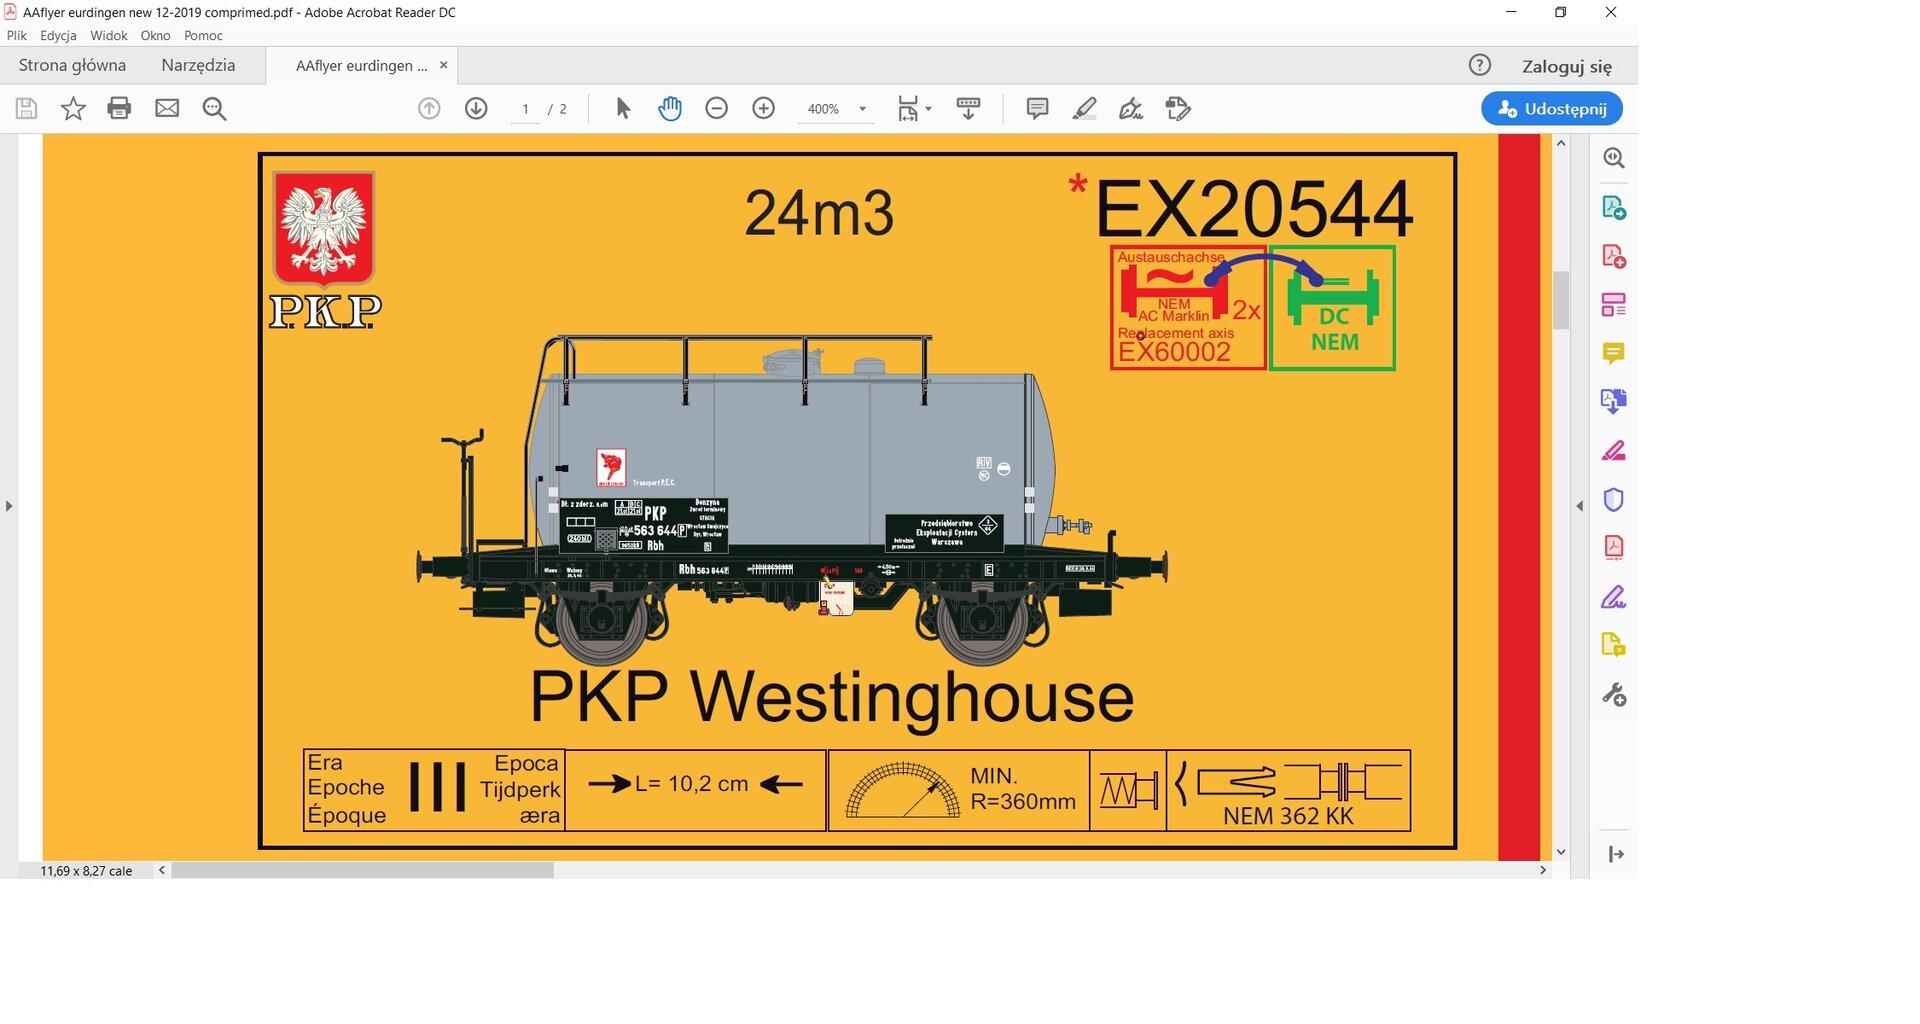 EX20544.jpg